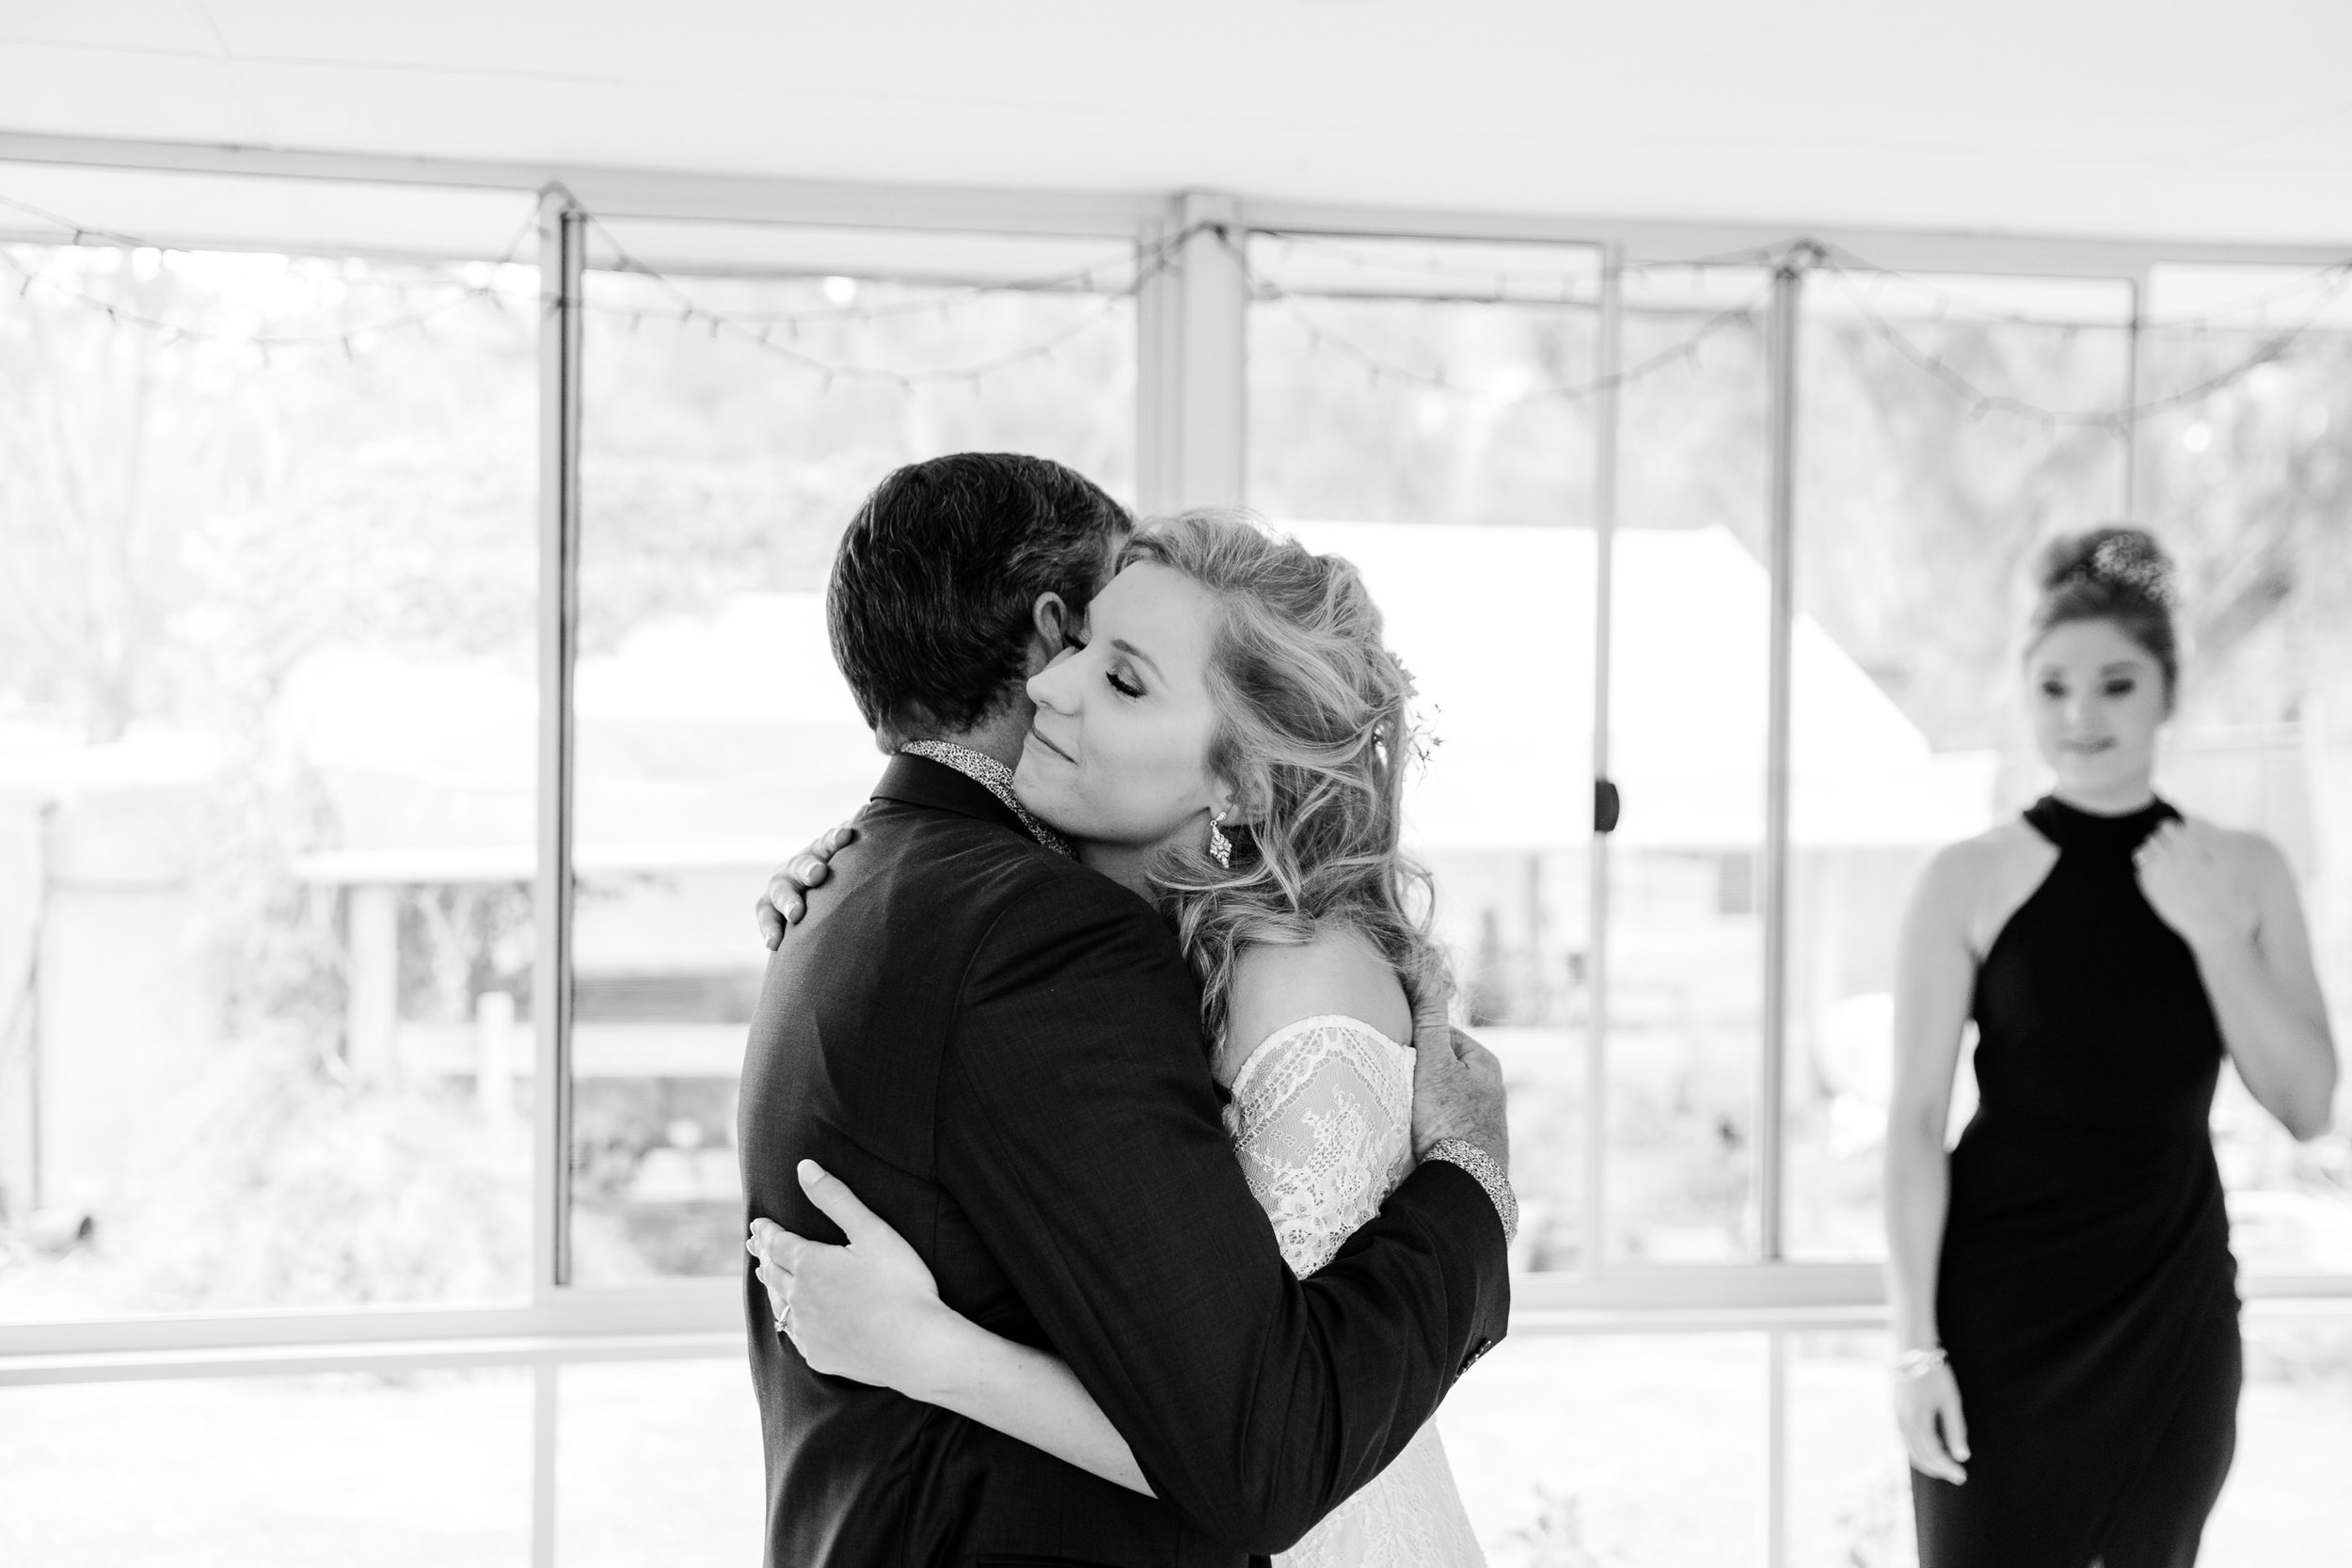 Justin_And_Jim_Photography_Backyard_Wedding152.JPG